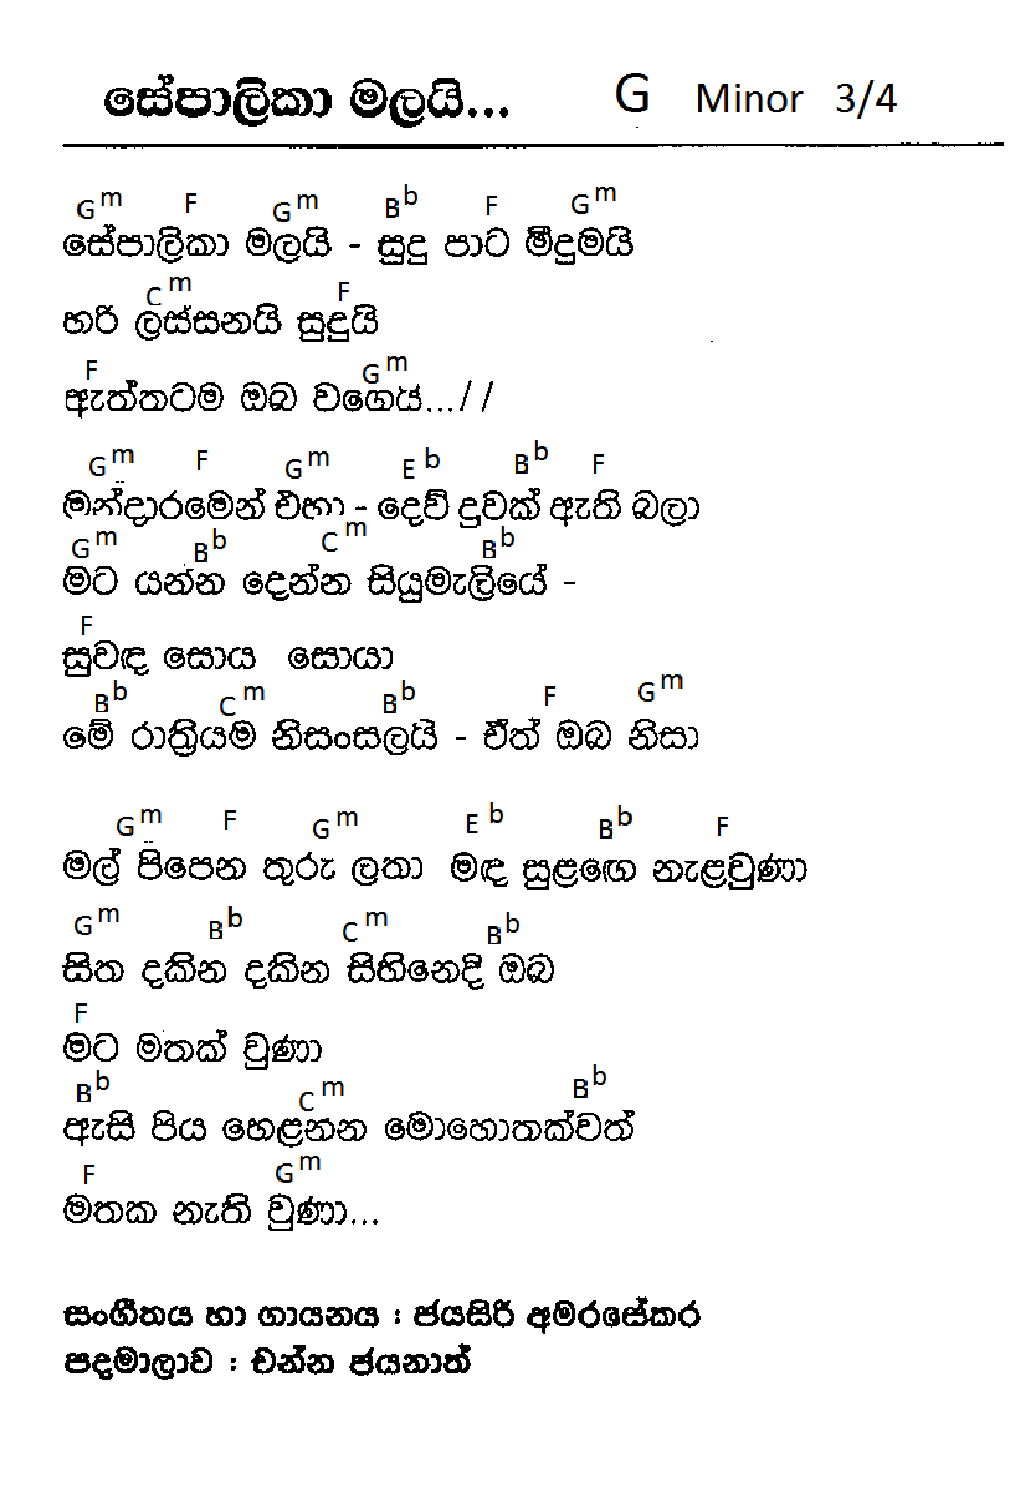 Sinhala Wal Katha Ammai Mamai Website Informer Fonts Pictures